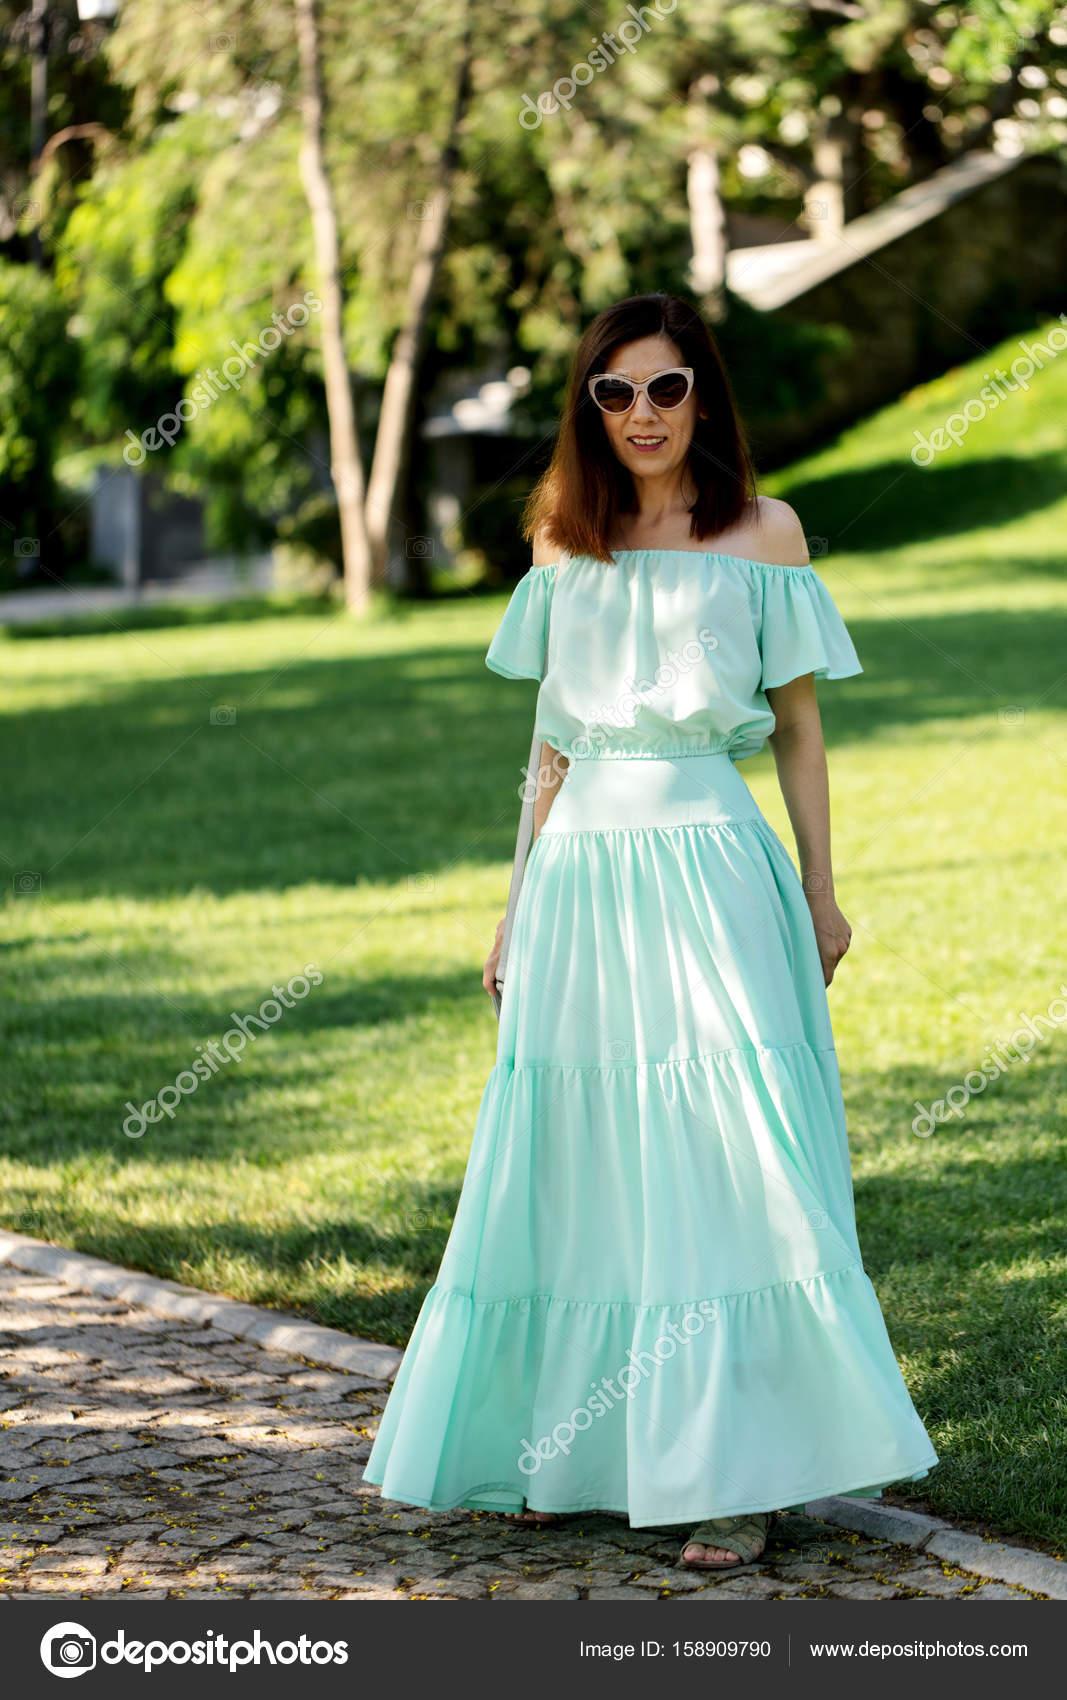 2f98267c7621 Νεαρή όμορφη γυναίκα σε ένα ελαφρύ παστέλ πράσινο μακρύ φόρεμα είναι με τα  πόδια — Φωτογραφία